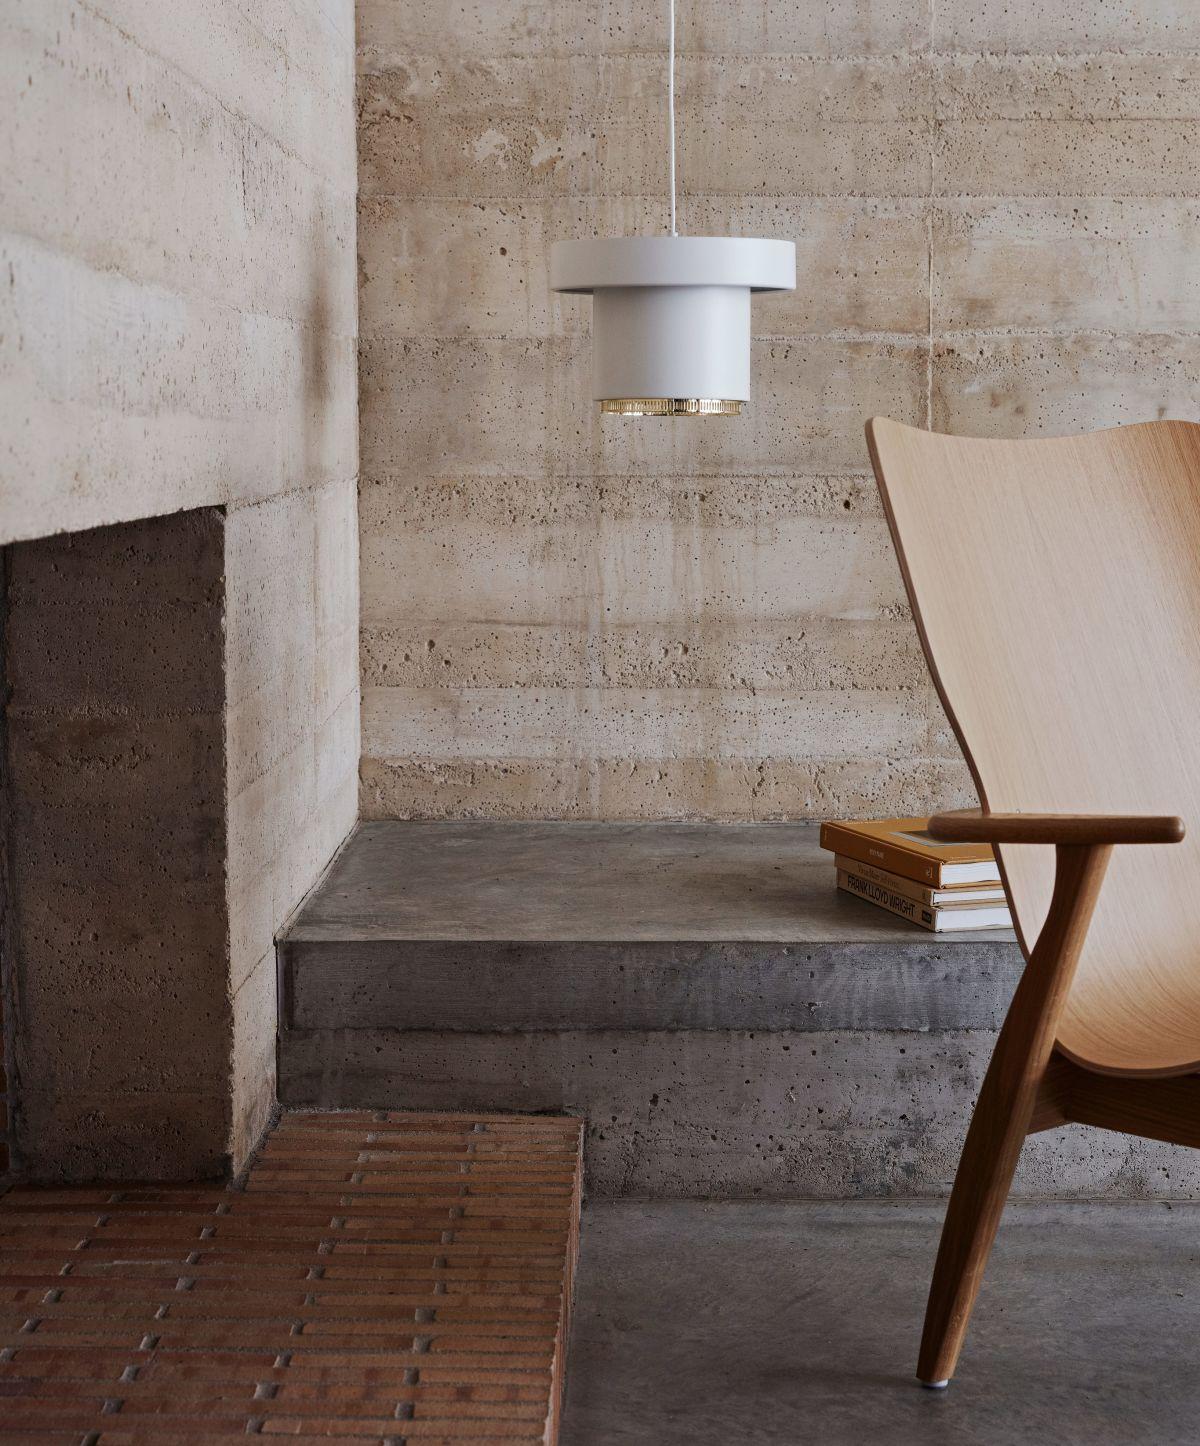 Pendant_light_A201_Domus_Lounge_Chair_photo_Mikko_Ryhanen-3192767